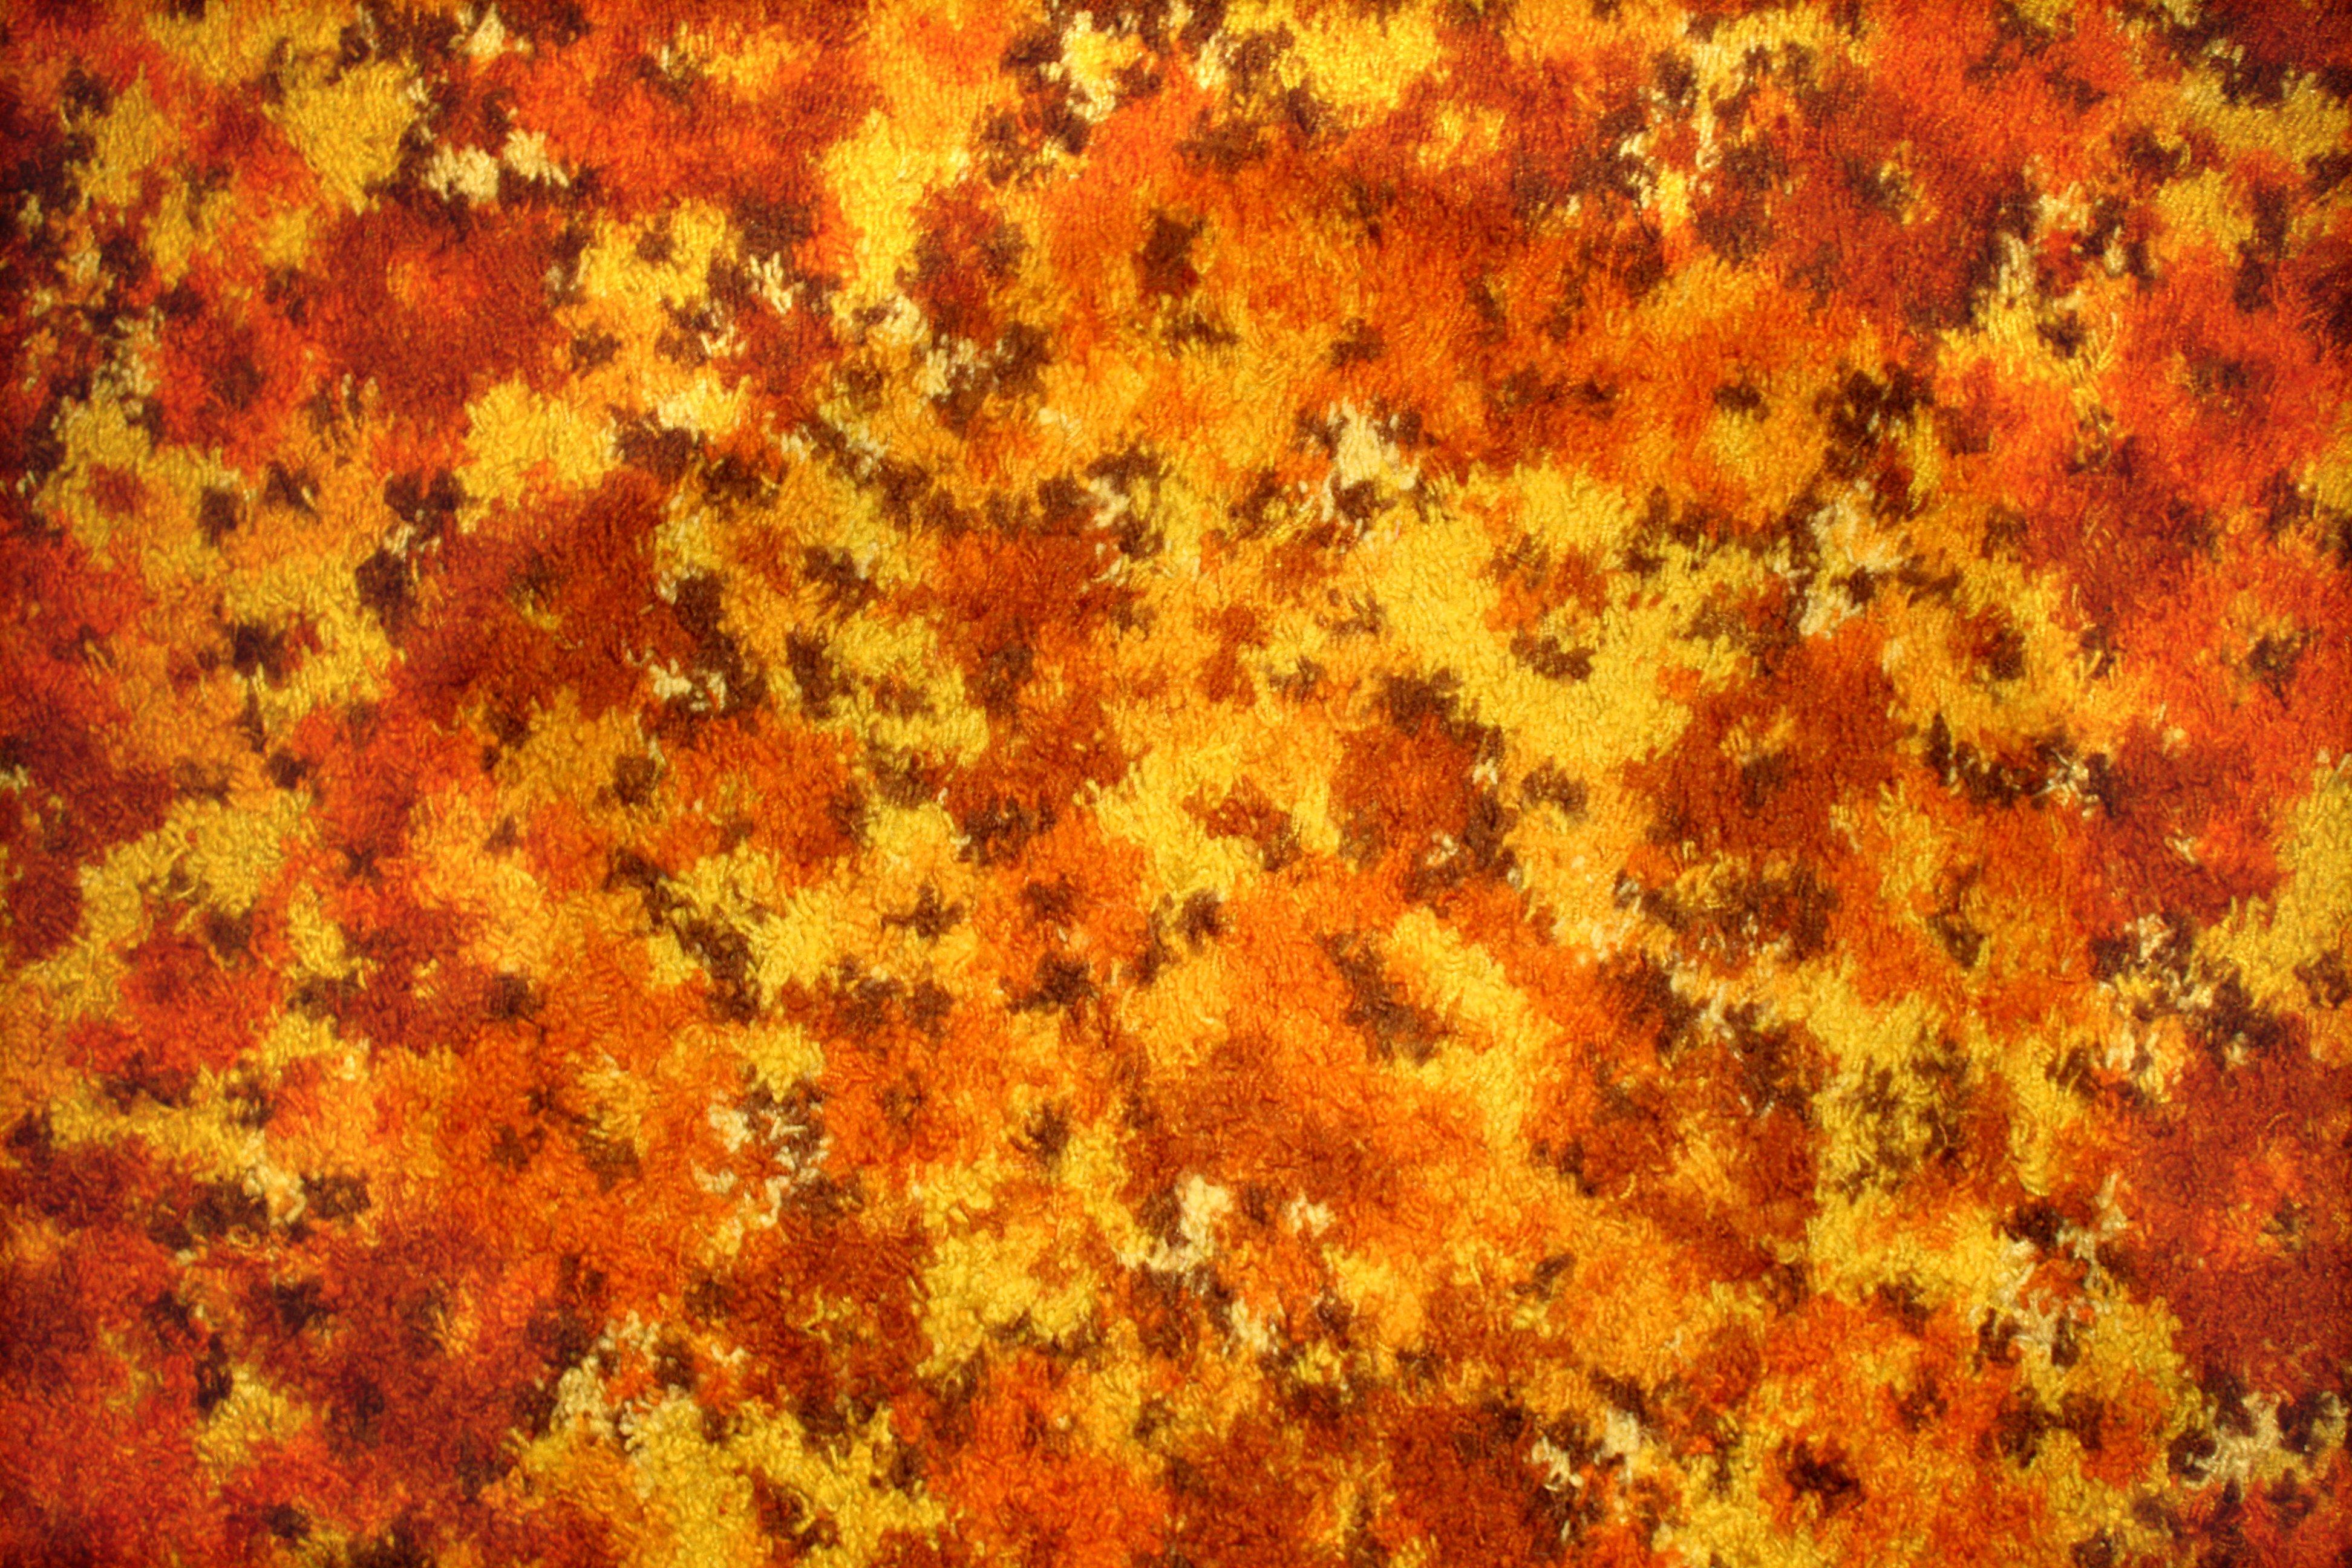 Orange floral carpet texture picture free photograph for Carpet texture high resolution